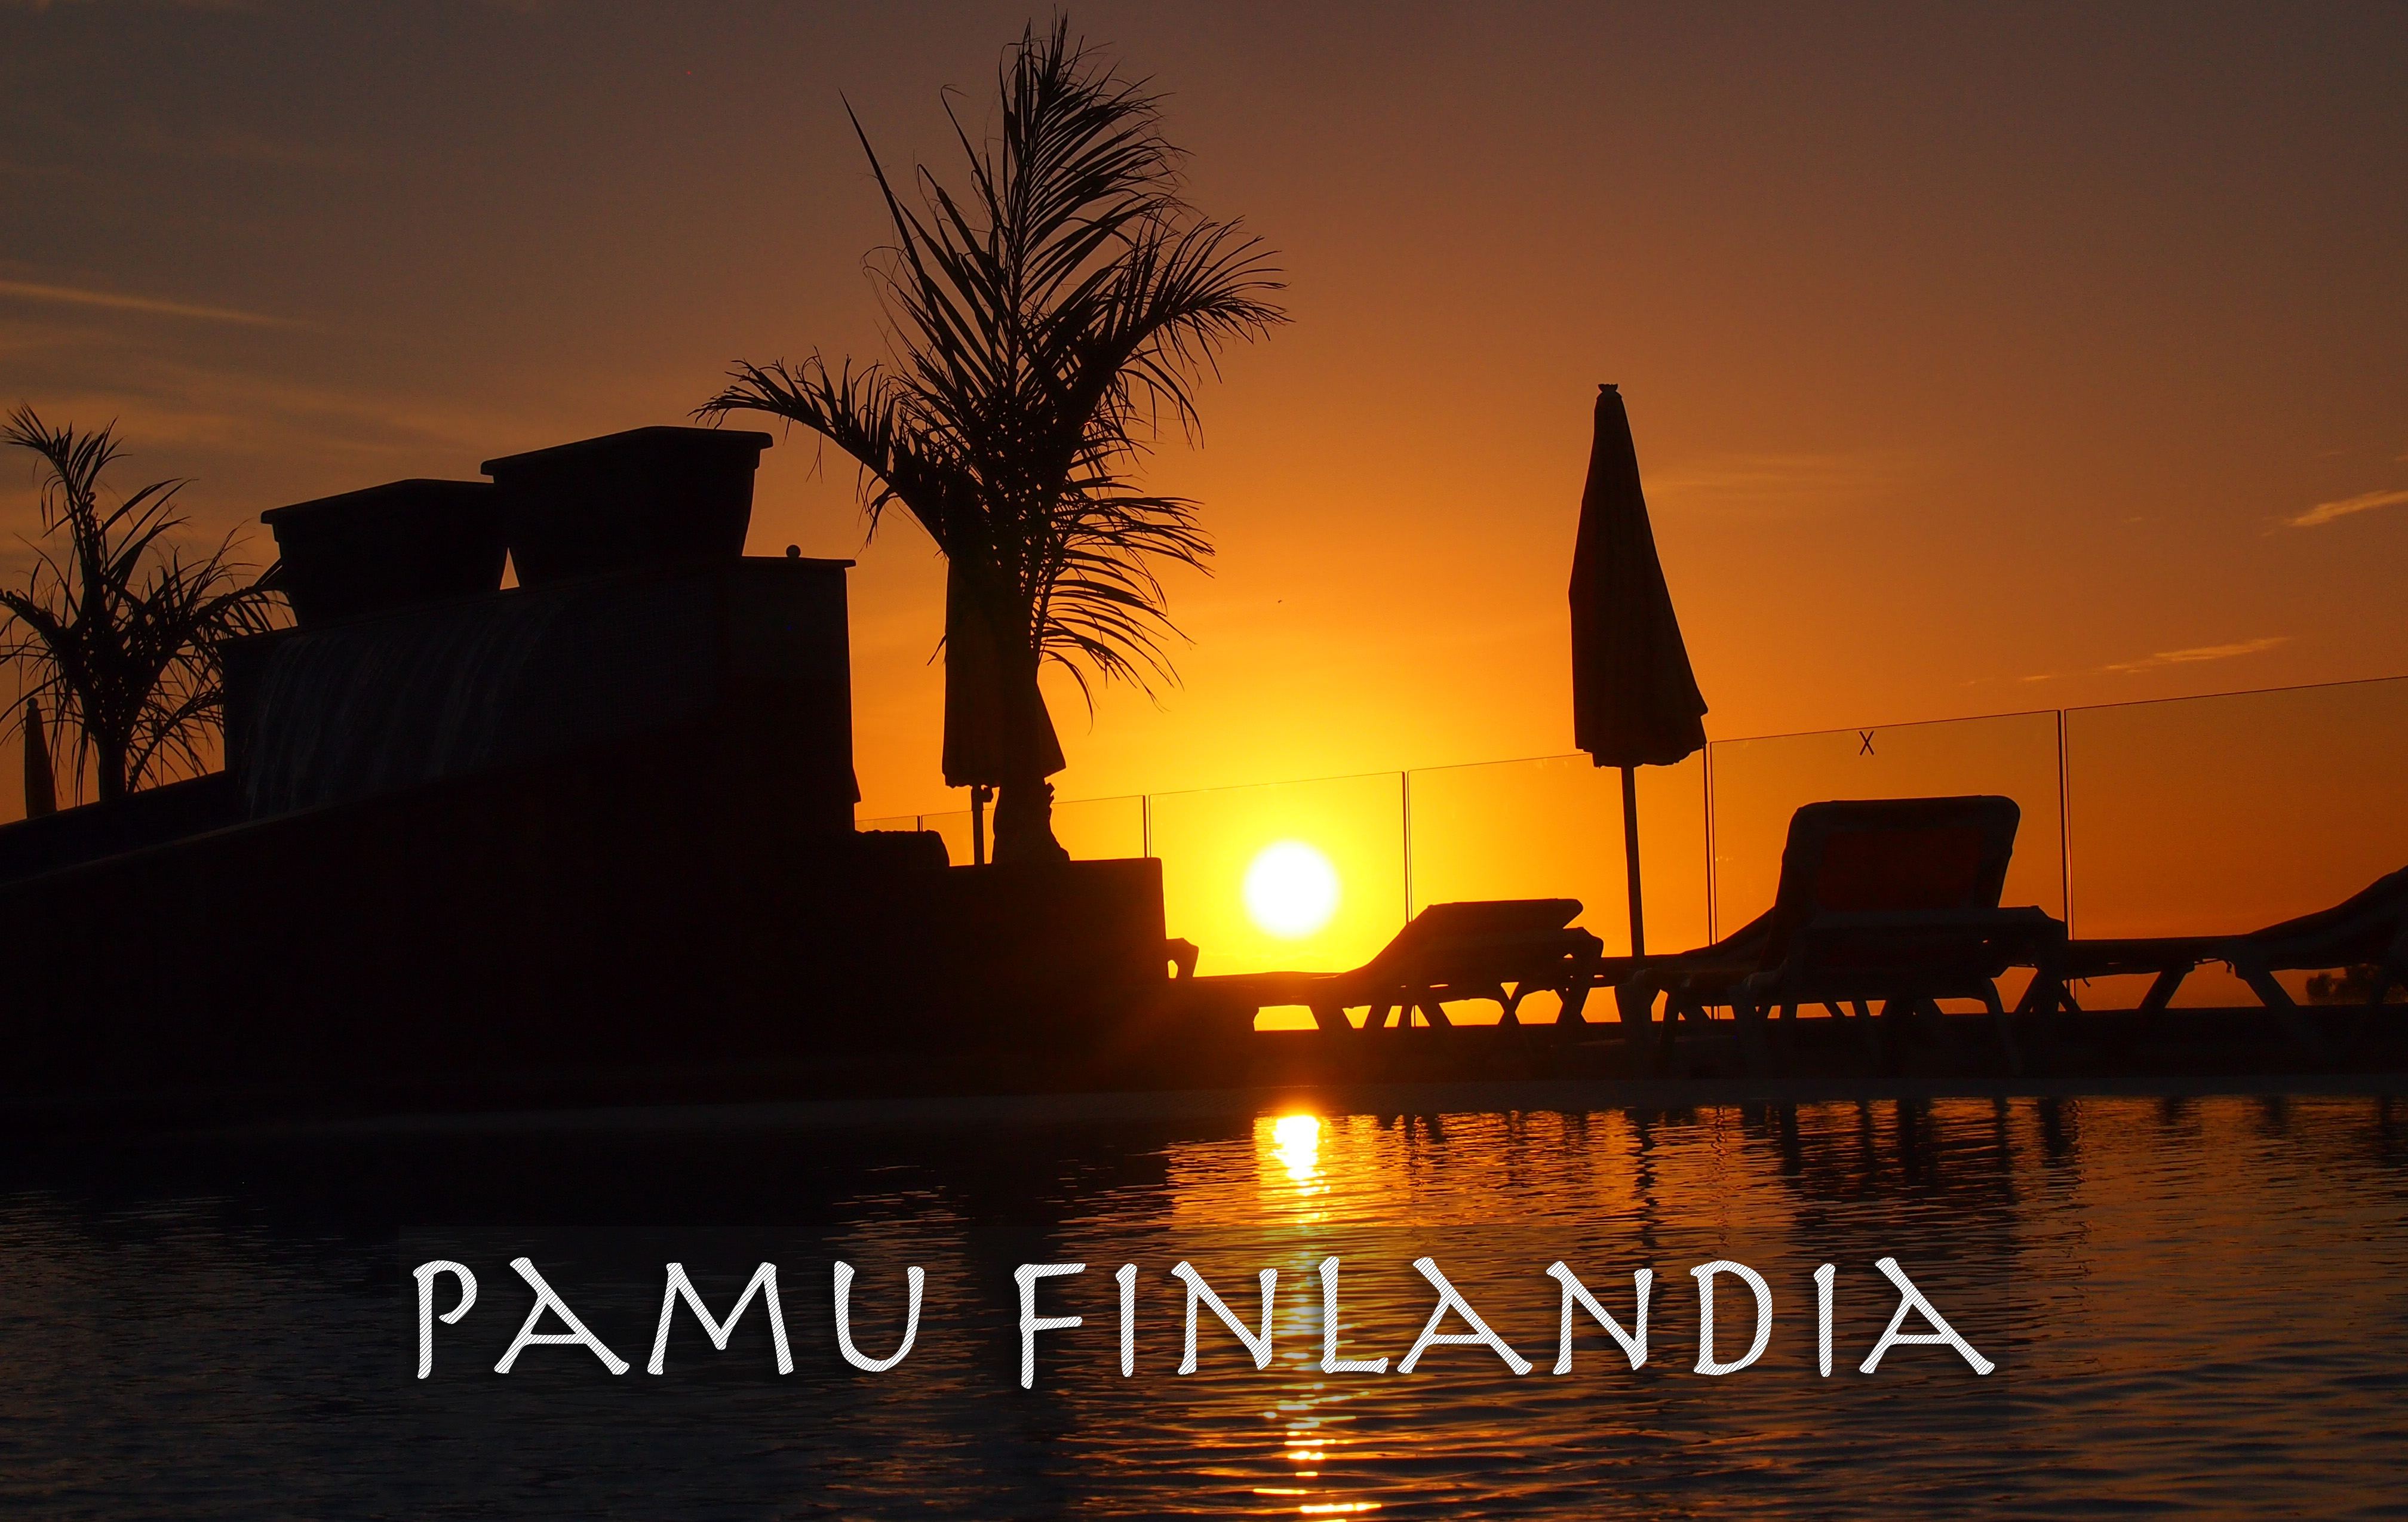 Pamu Finlandia